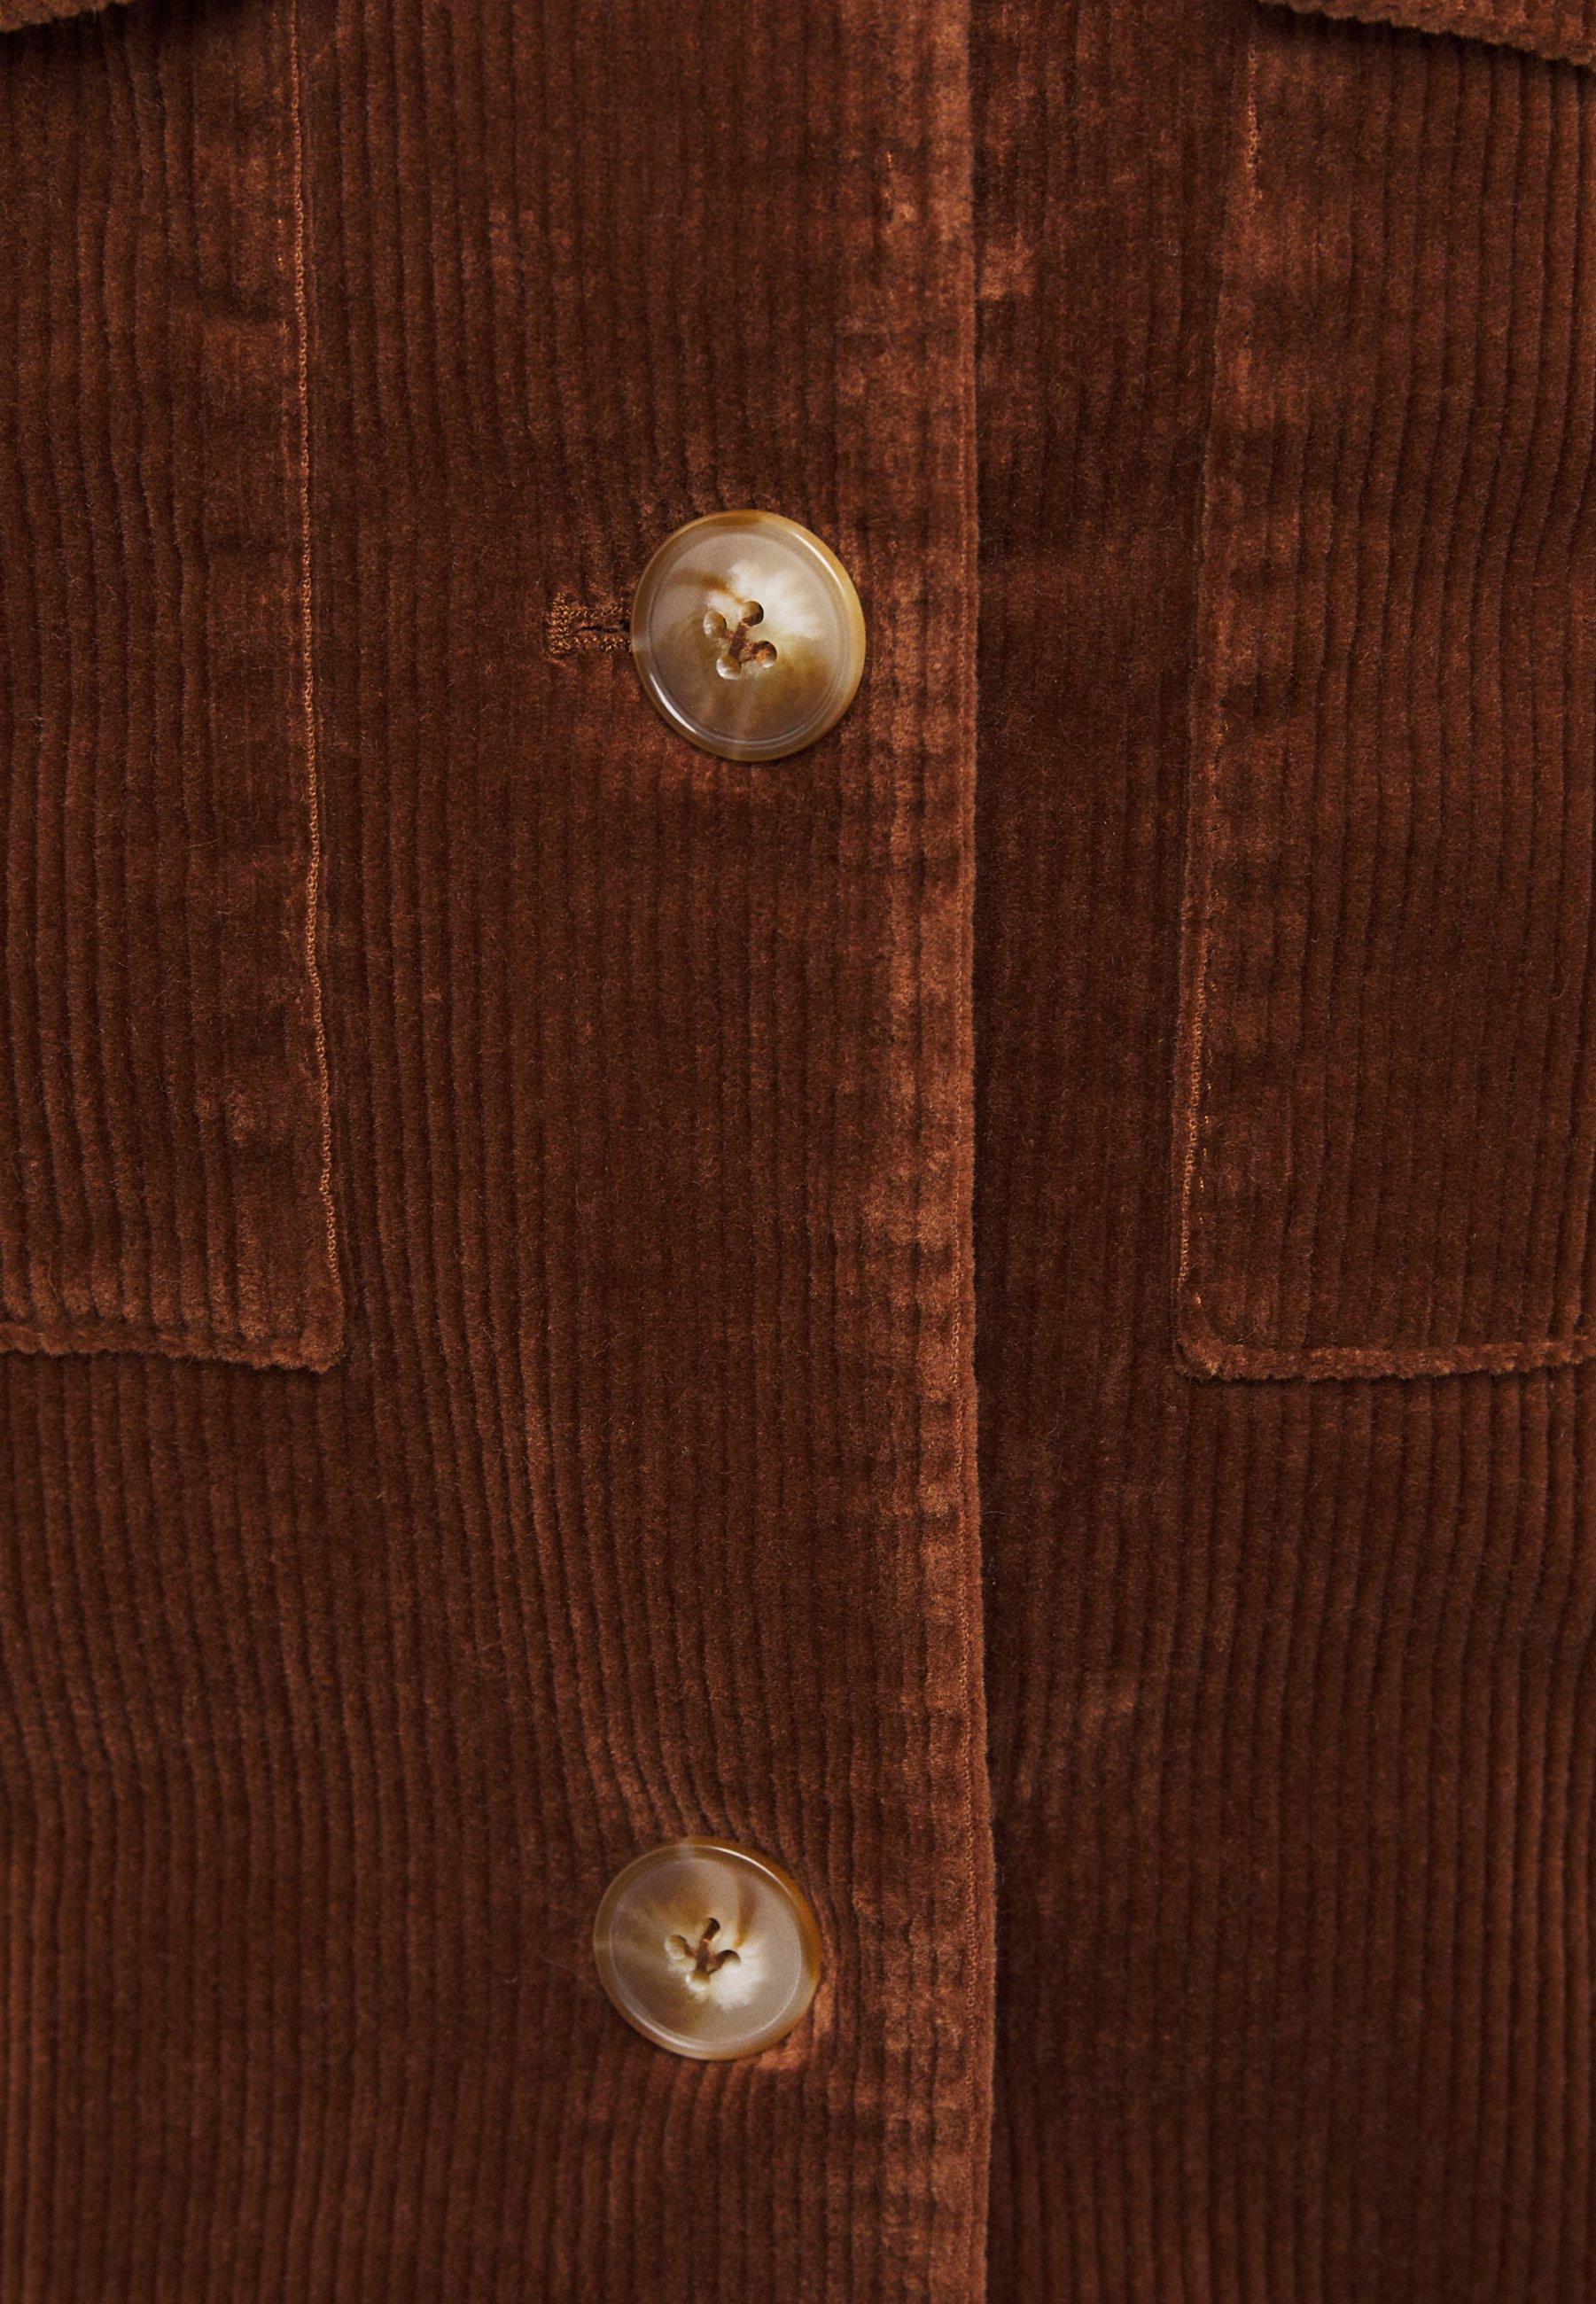 Fashionable Classic Women's Clothing Marc O'Polo JACKET RAGLAN SLEEVE TURN DOWN Summer jacket chestnut brown bu2kxpwj8 SvgRCJ3zZ